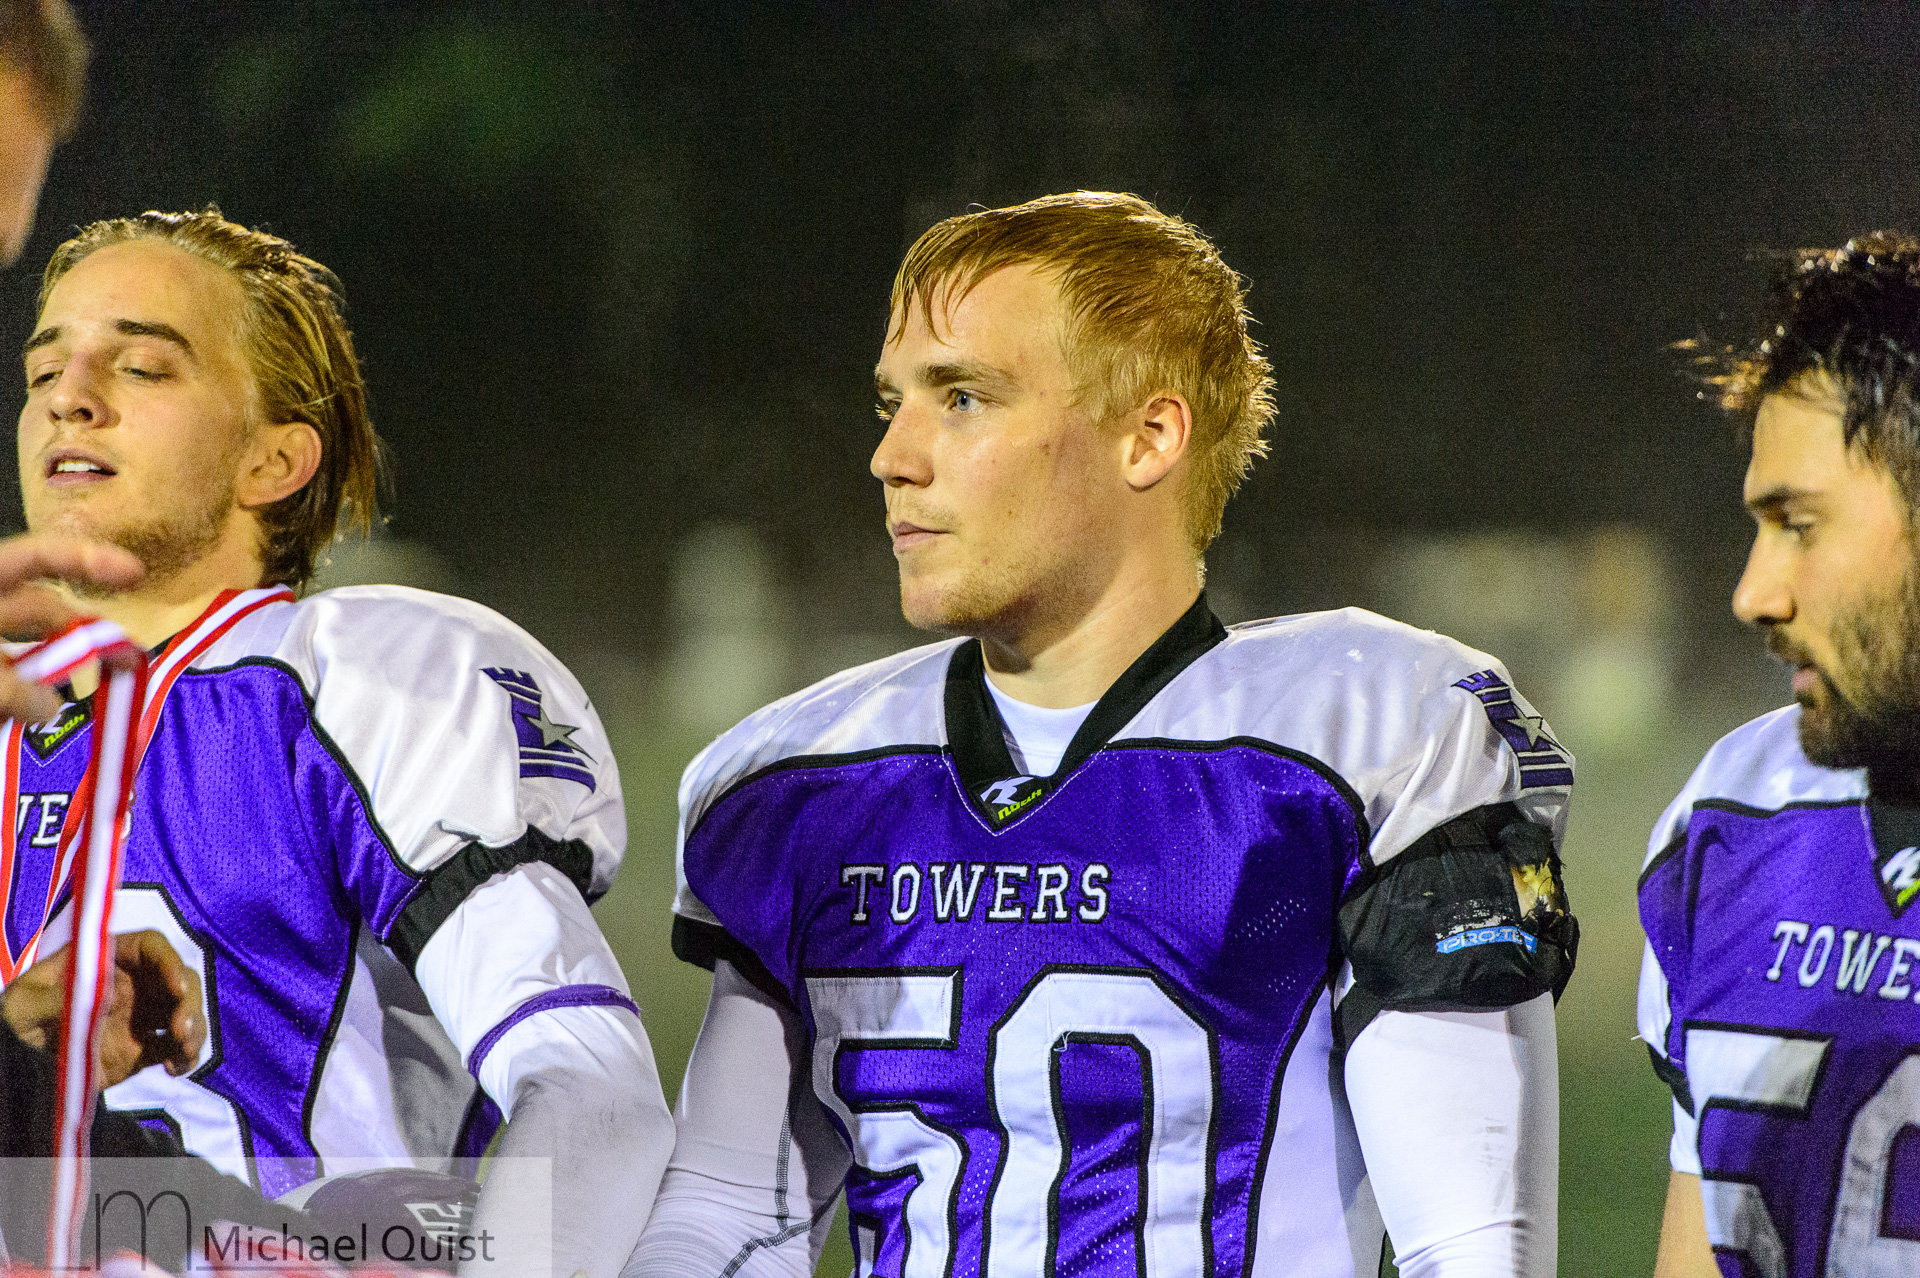 Junior-Bowl-2015-Copenhagen-Towers-vs-Herlev-Rebels-255